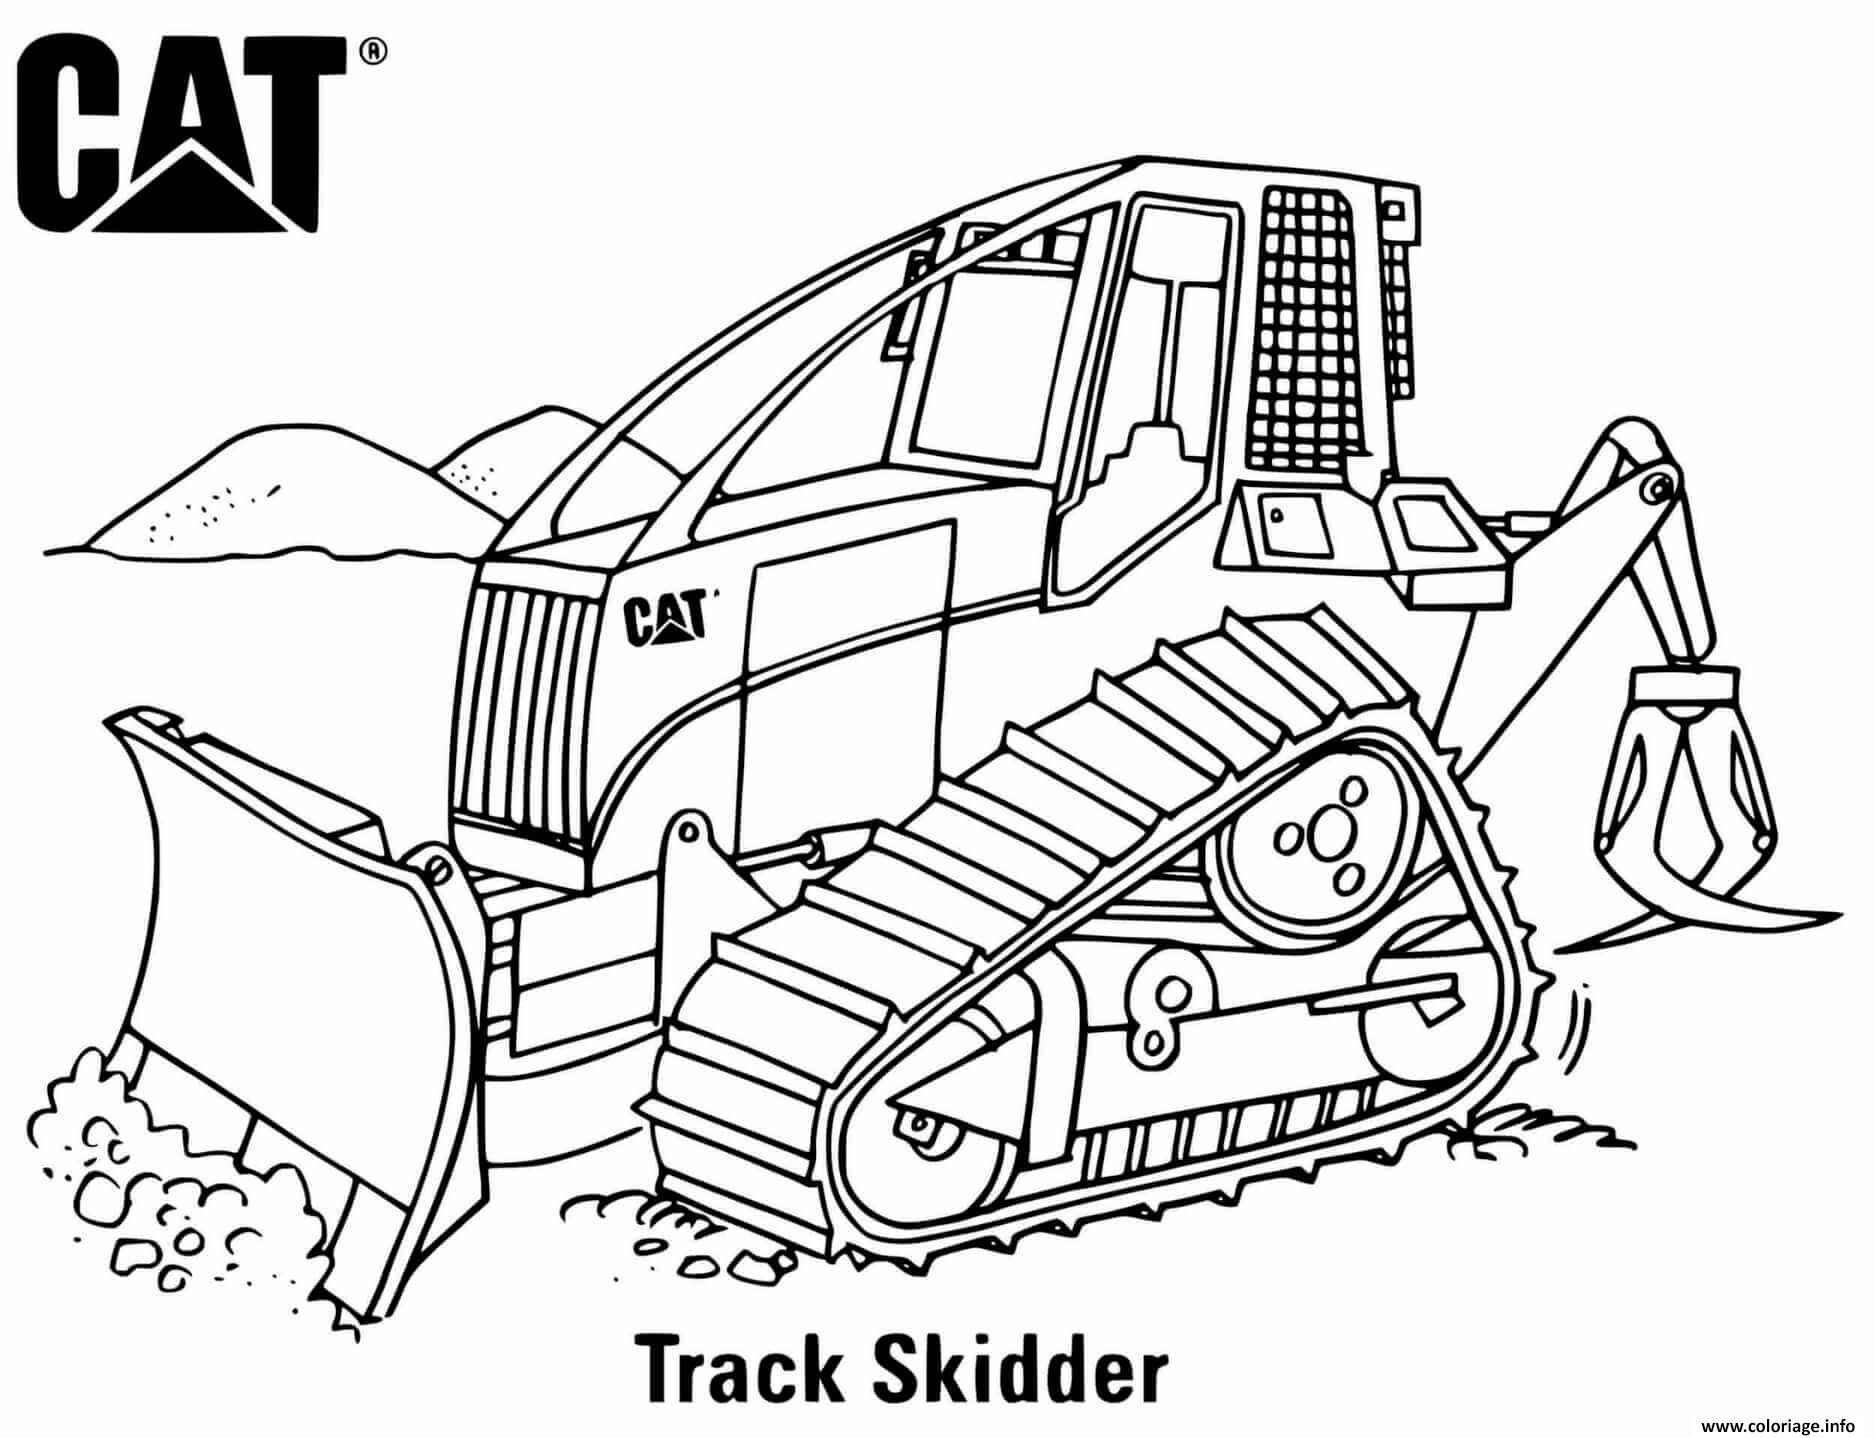 Dessin track skidder engin chantier Coloriage Gratuit à Imprimer